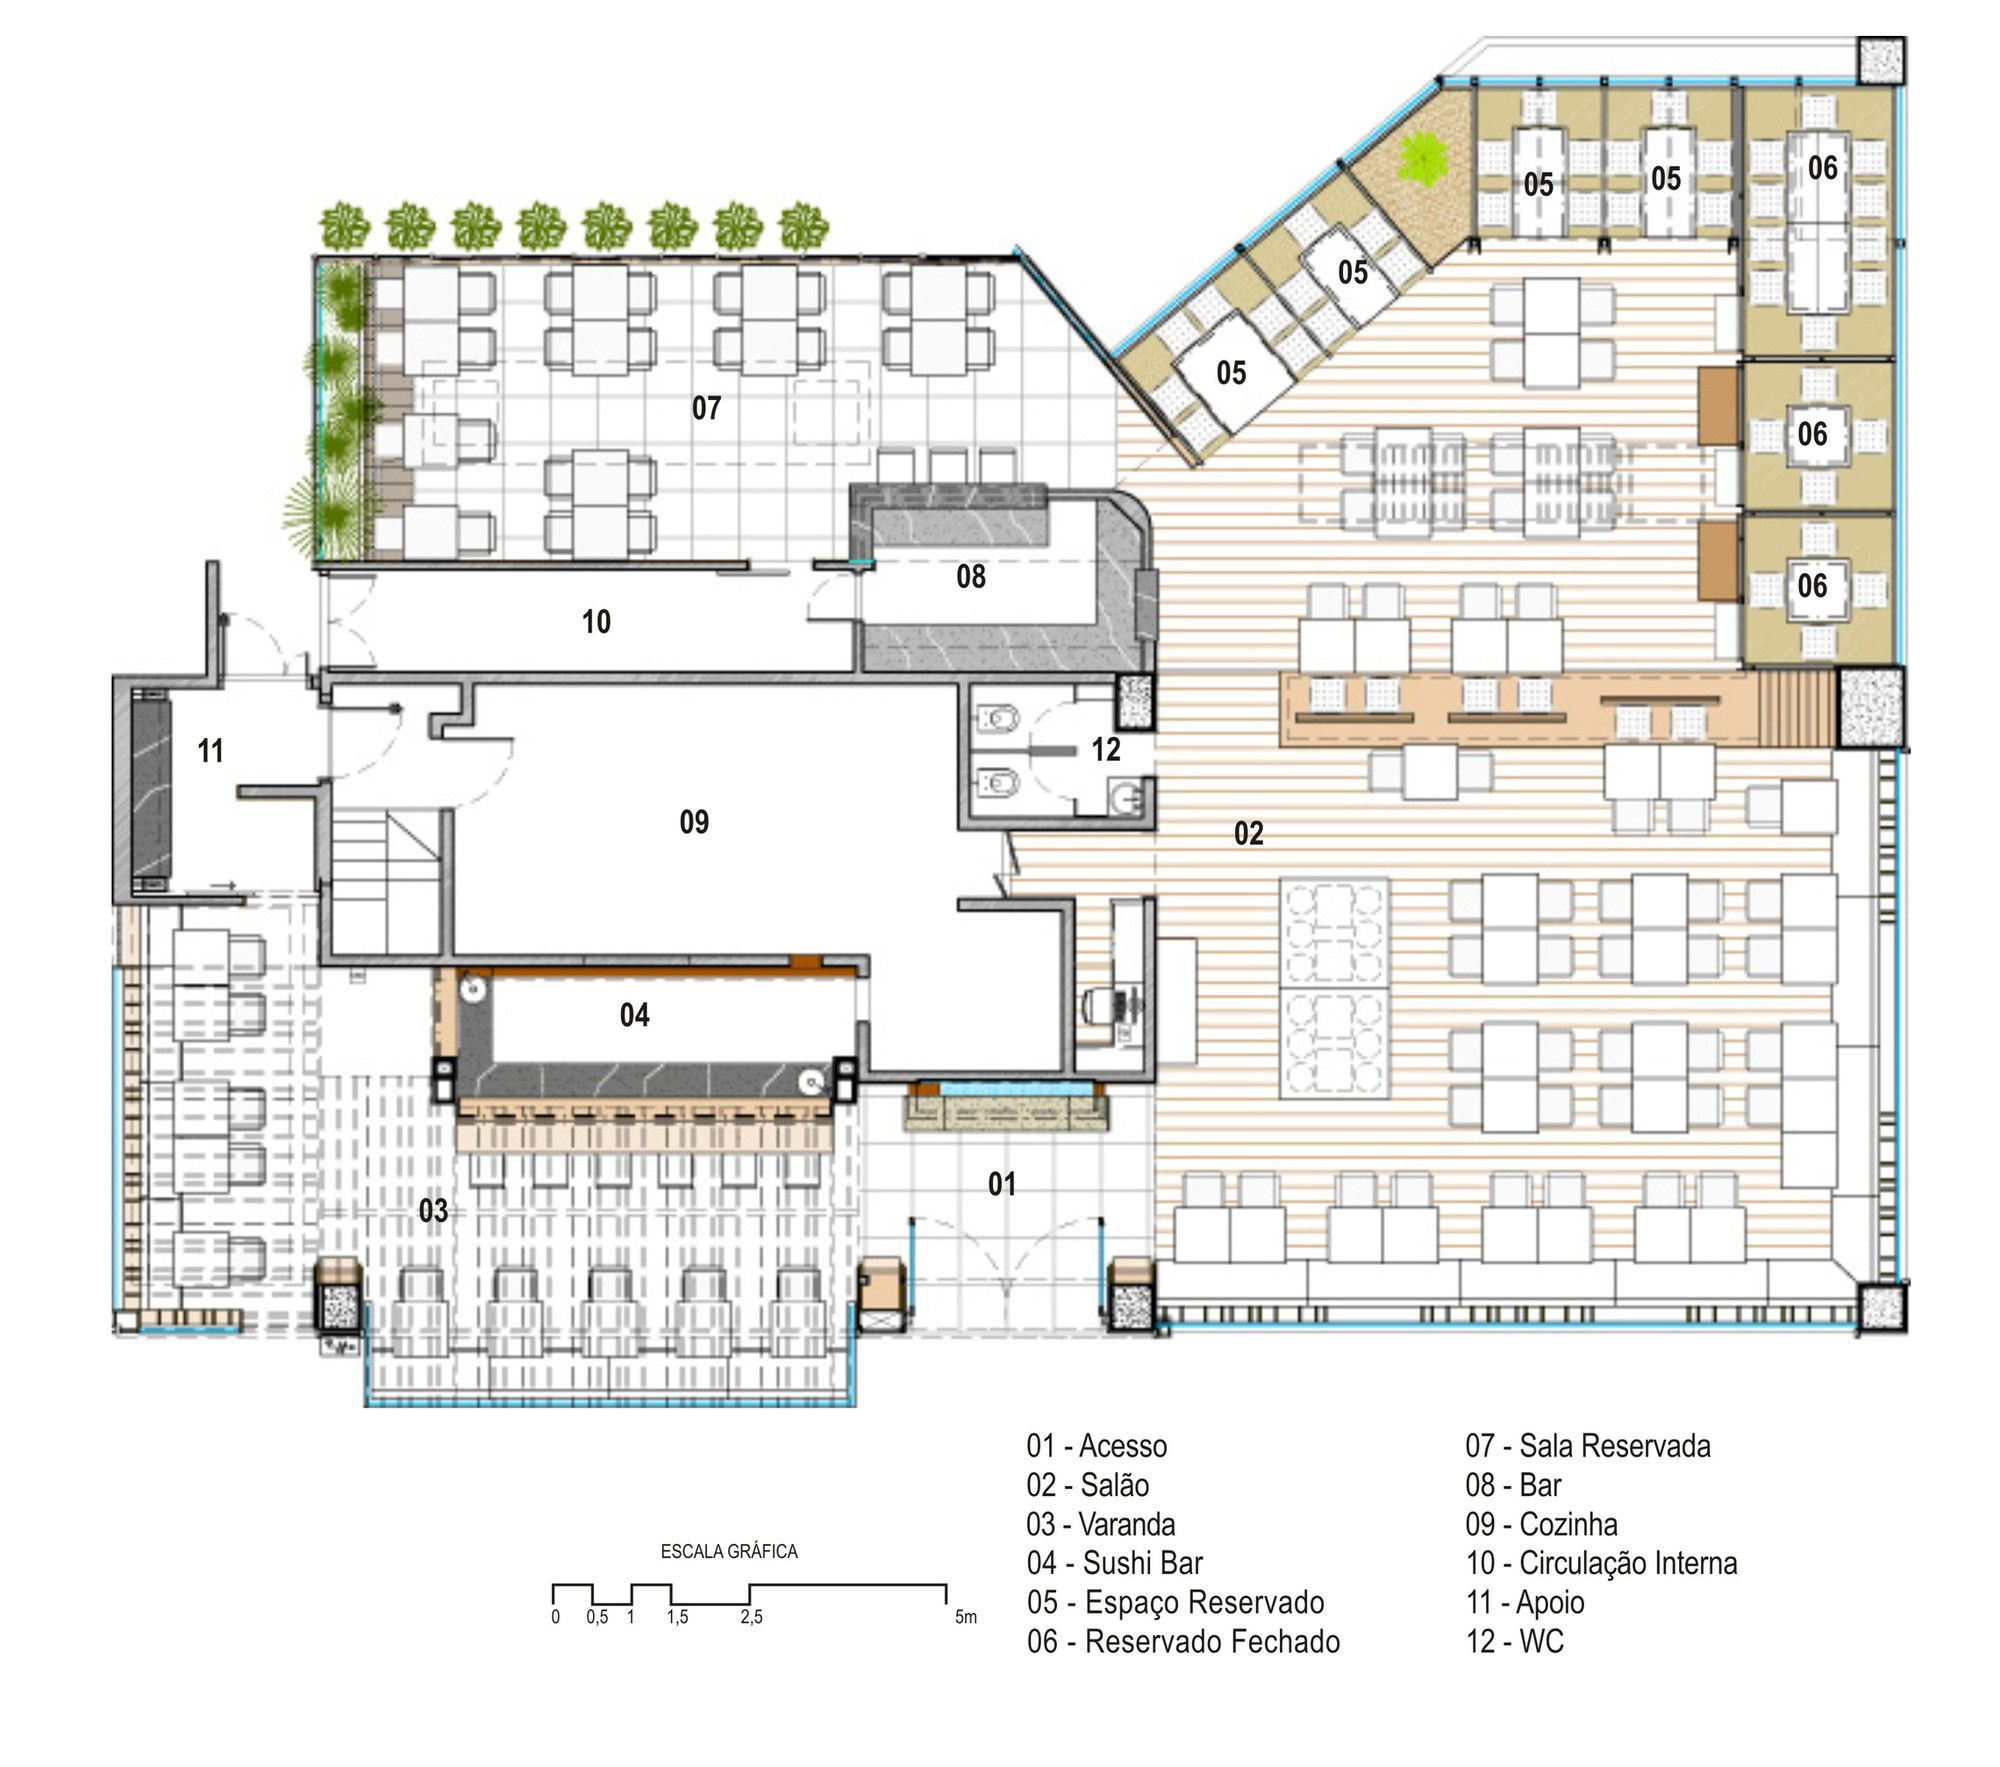 Galeria de restaurante kotobuki ivan rezende arquitetura for Cafeteria escolar proyecto